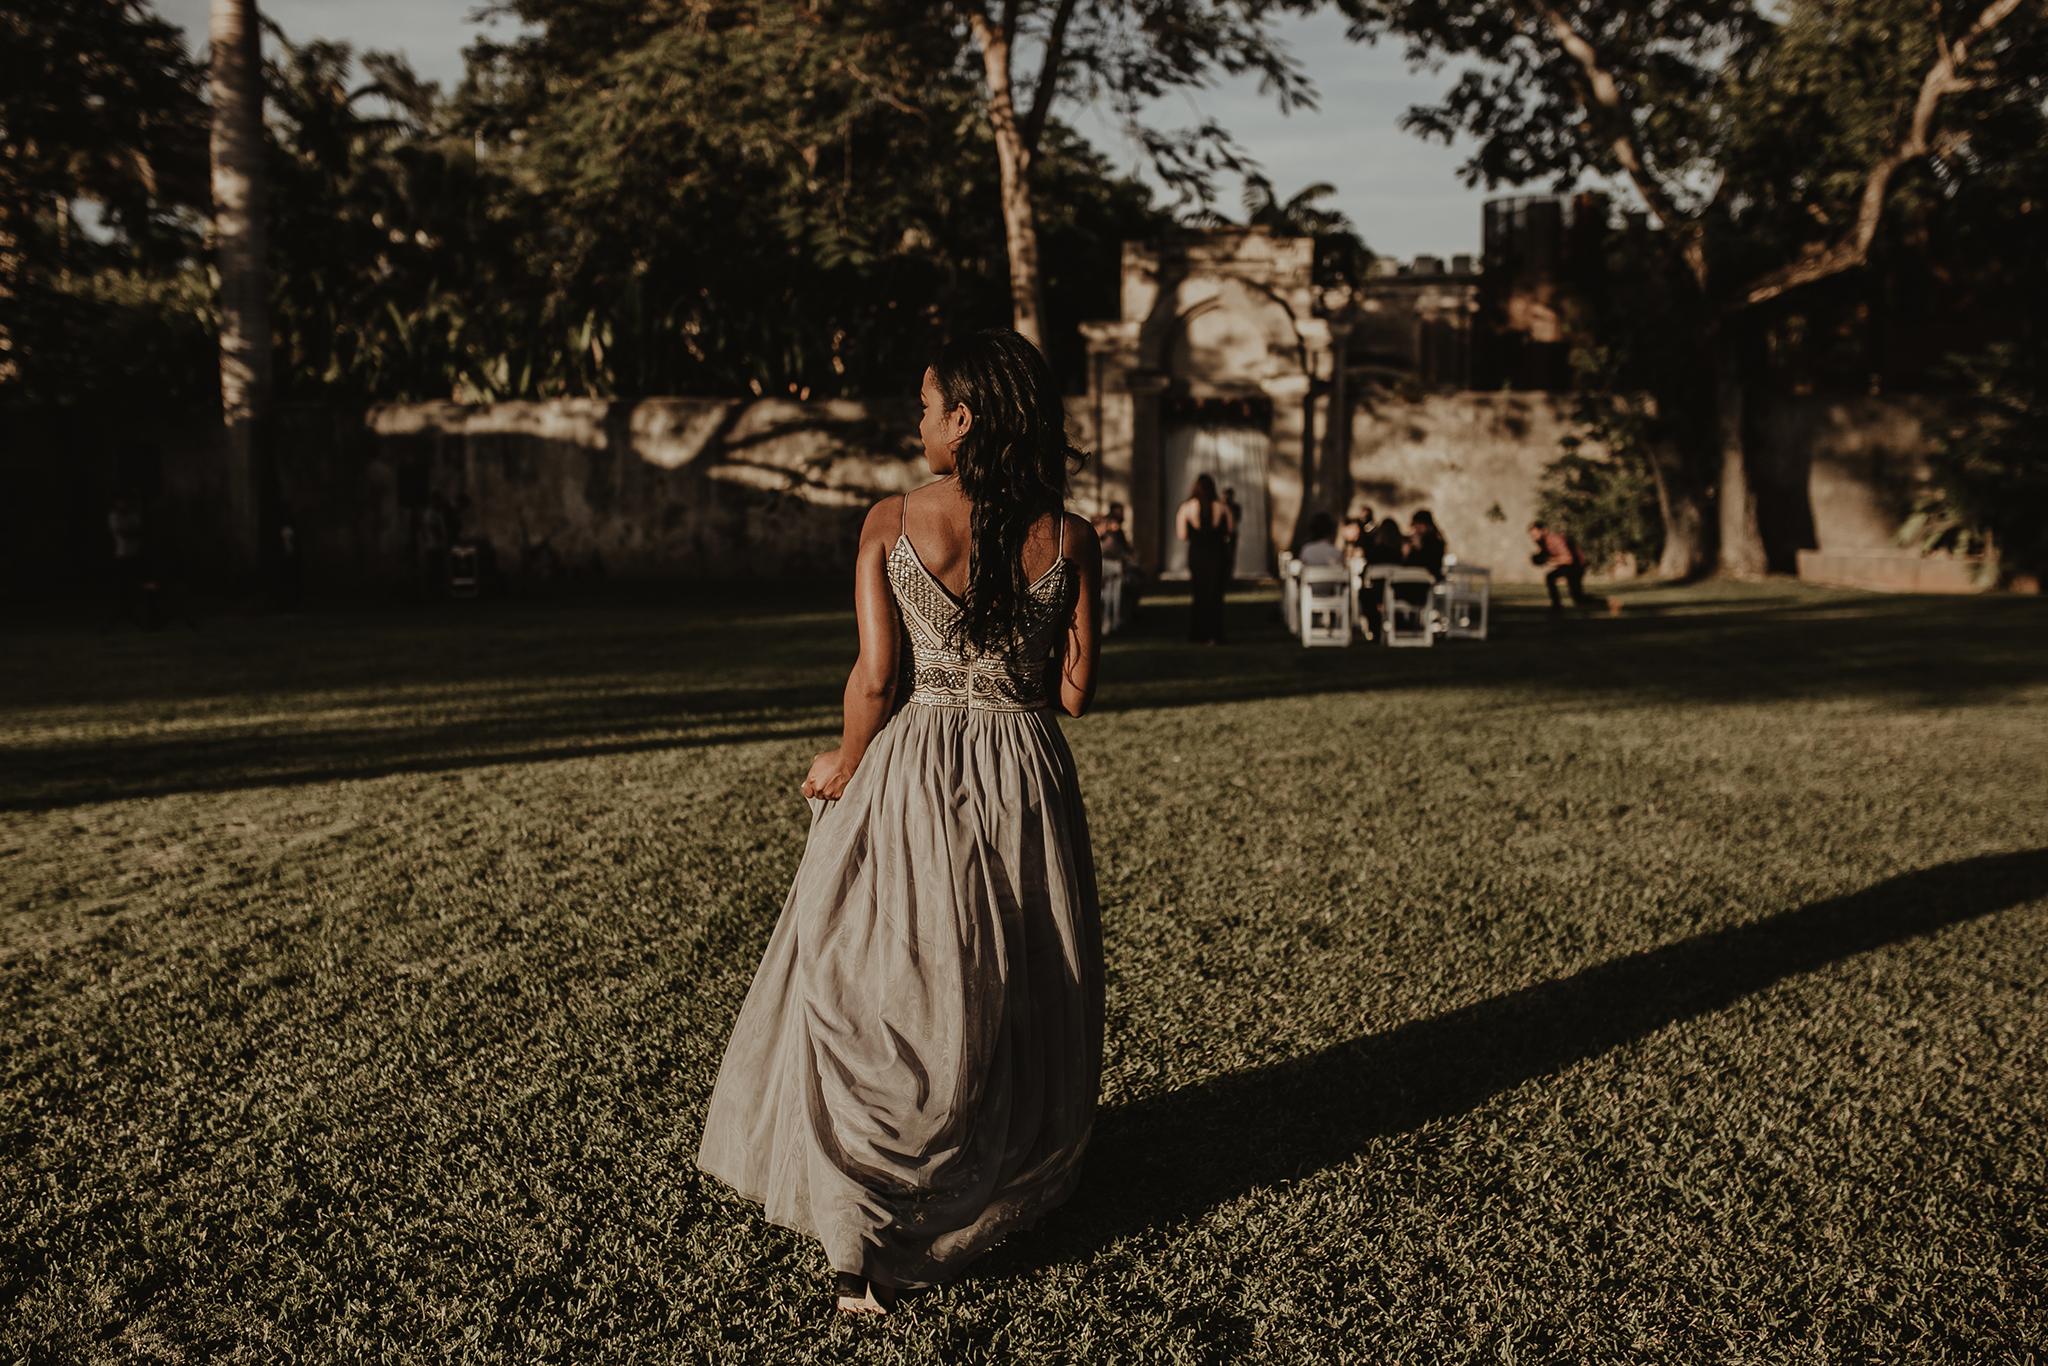 0260V&Aslide_HaciendaSacChic_WeddingGay_WeddingDstination_MeridaYucatan_HaciendasMerida_BodasMexico_BodasYucatan_Boda_Destino.jpg